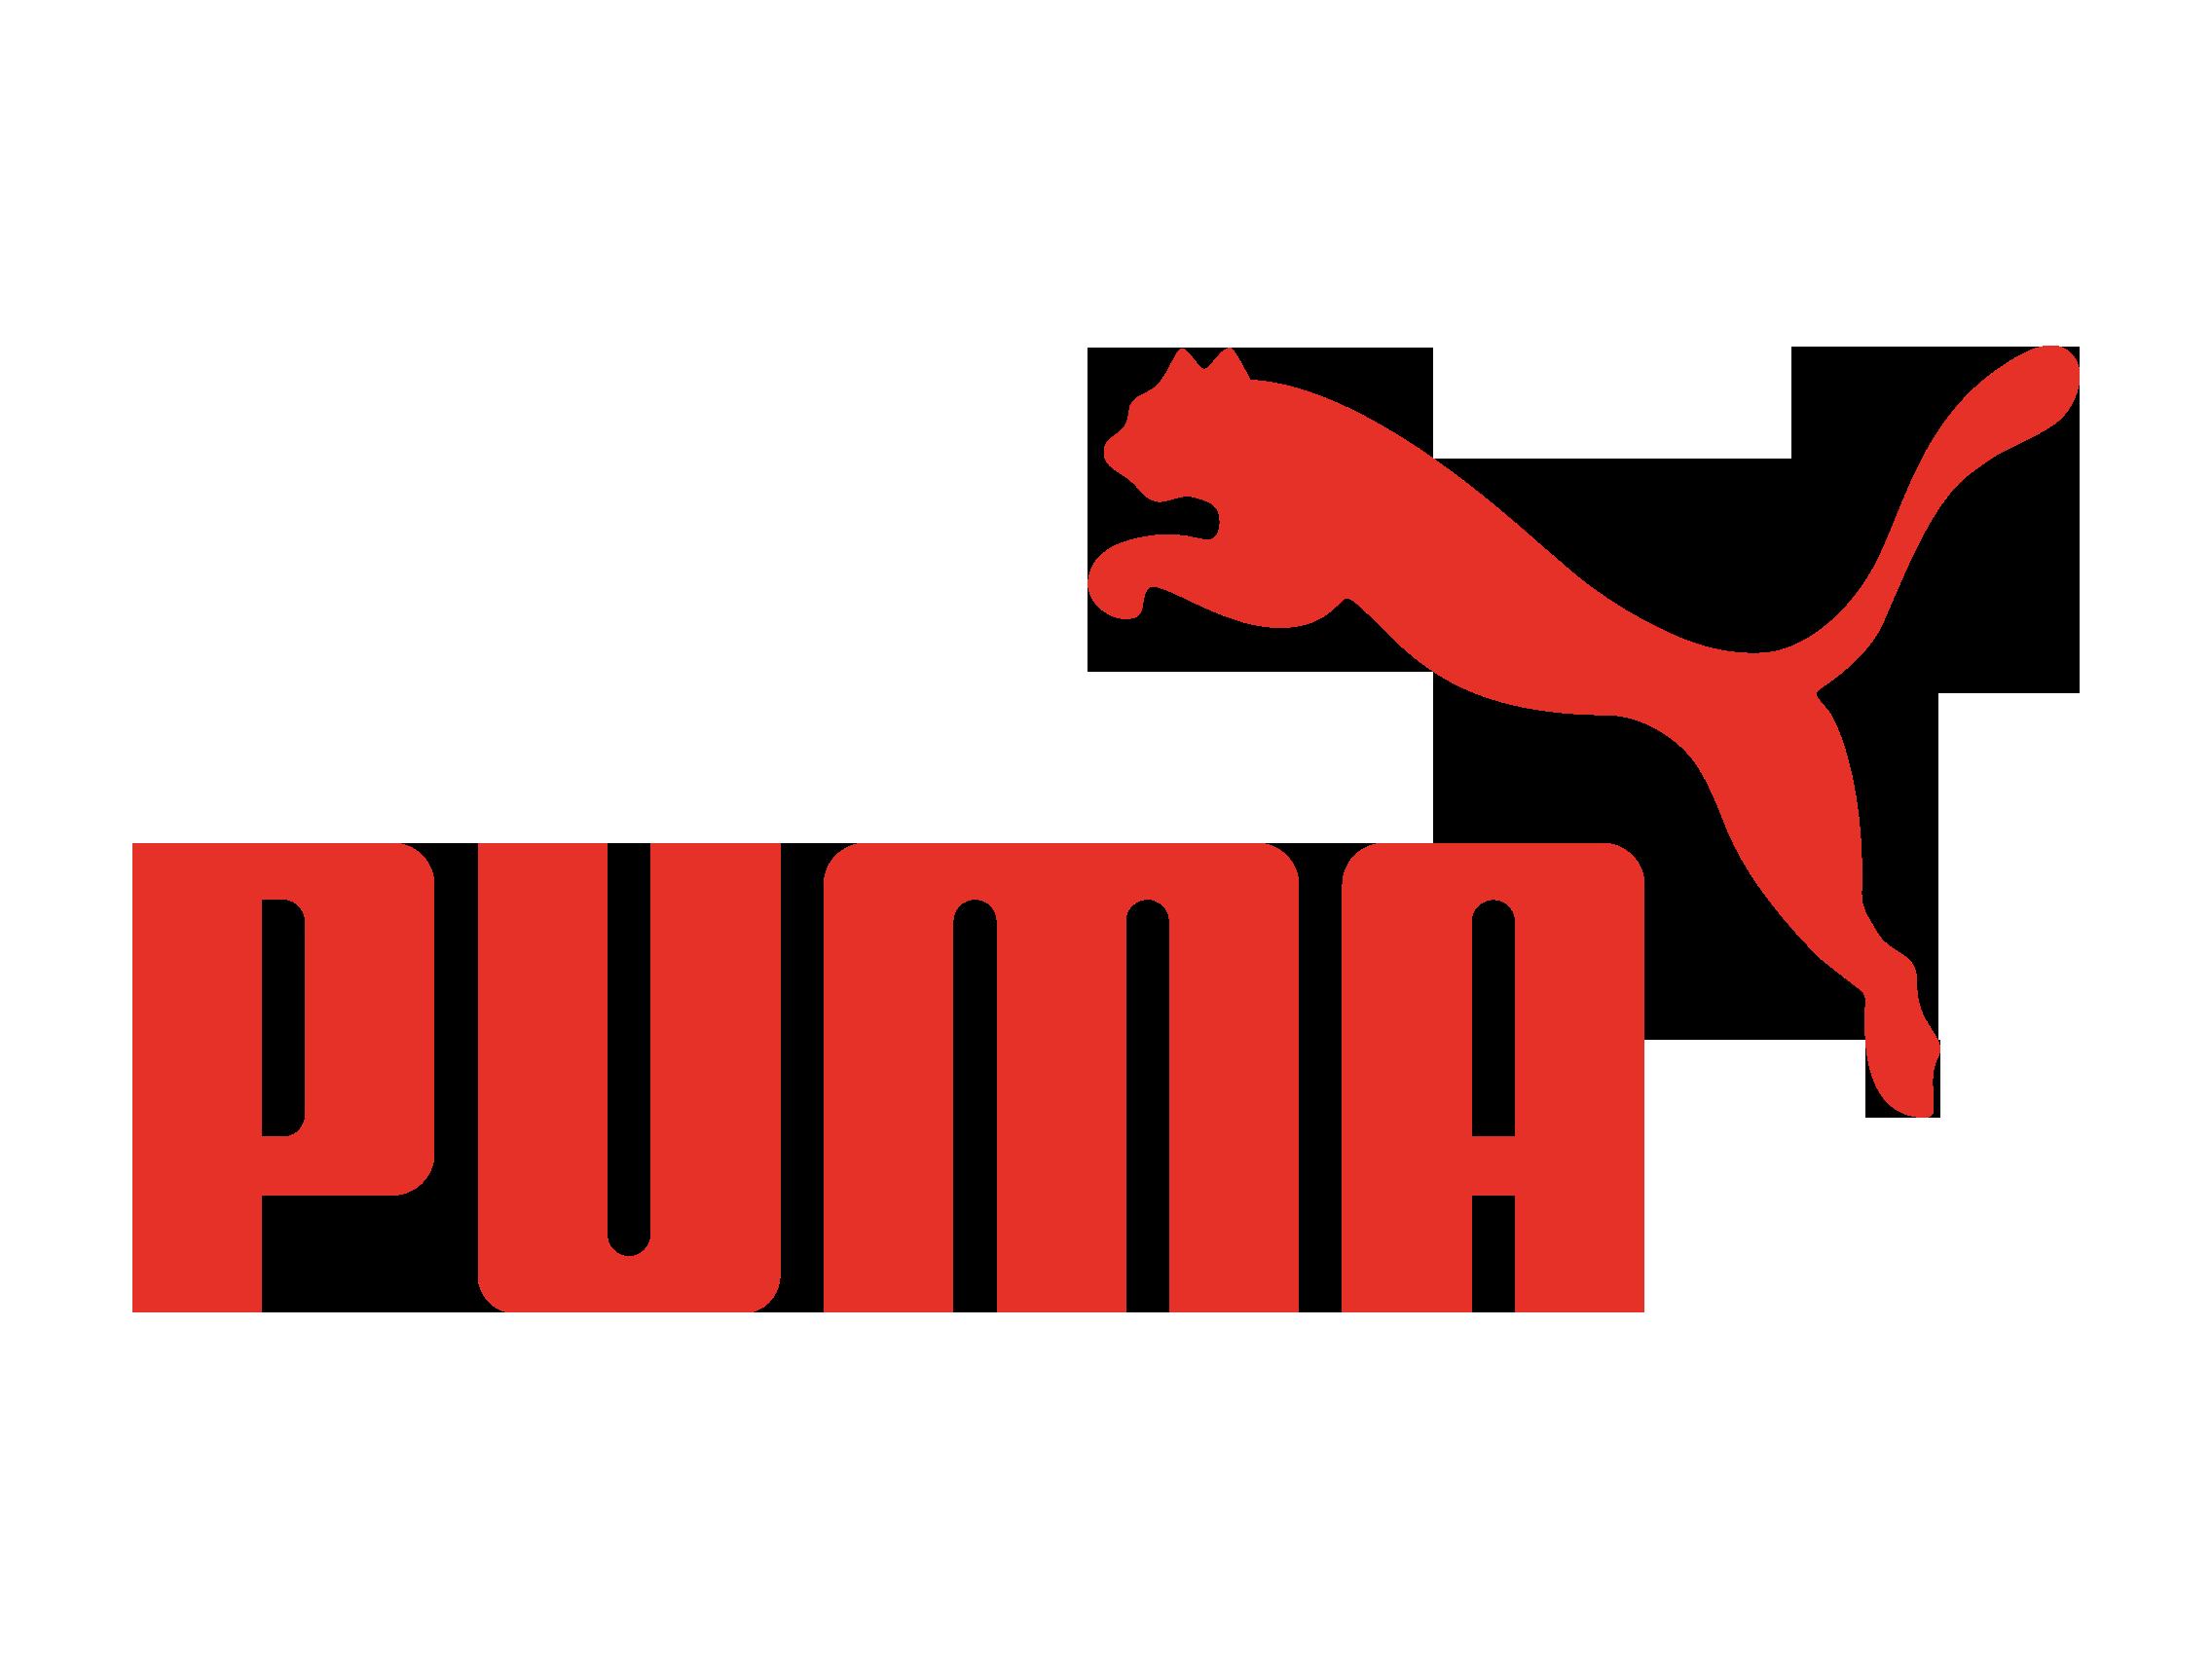 puma red logo png #1143